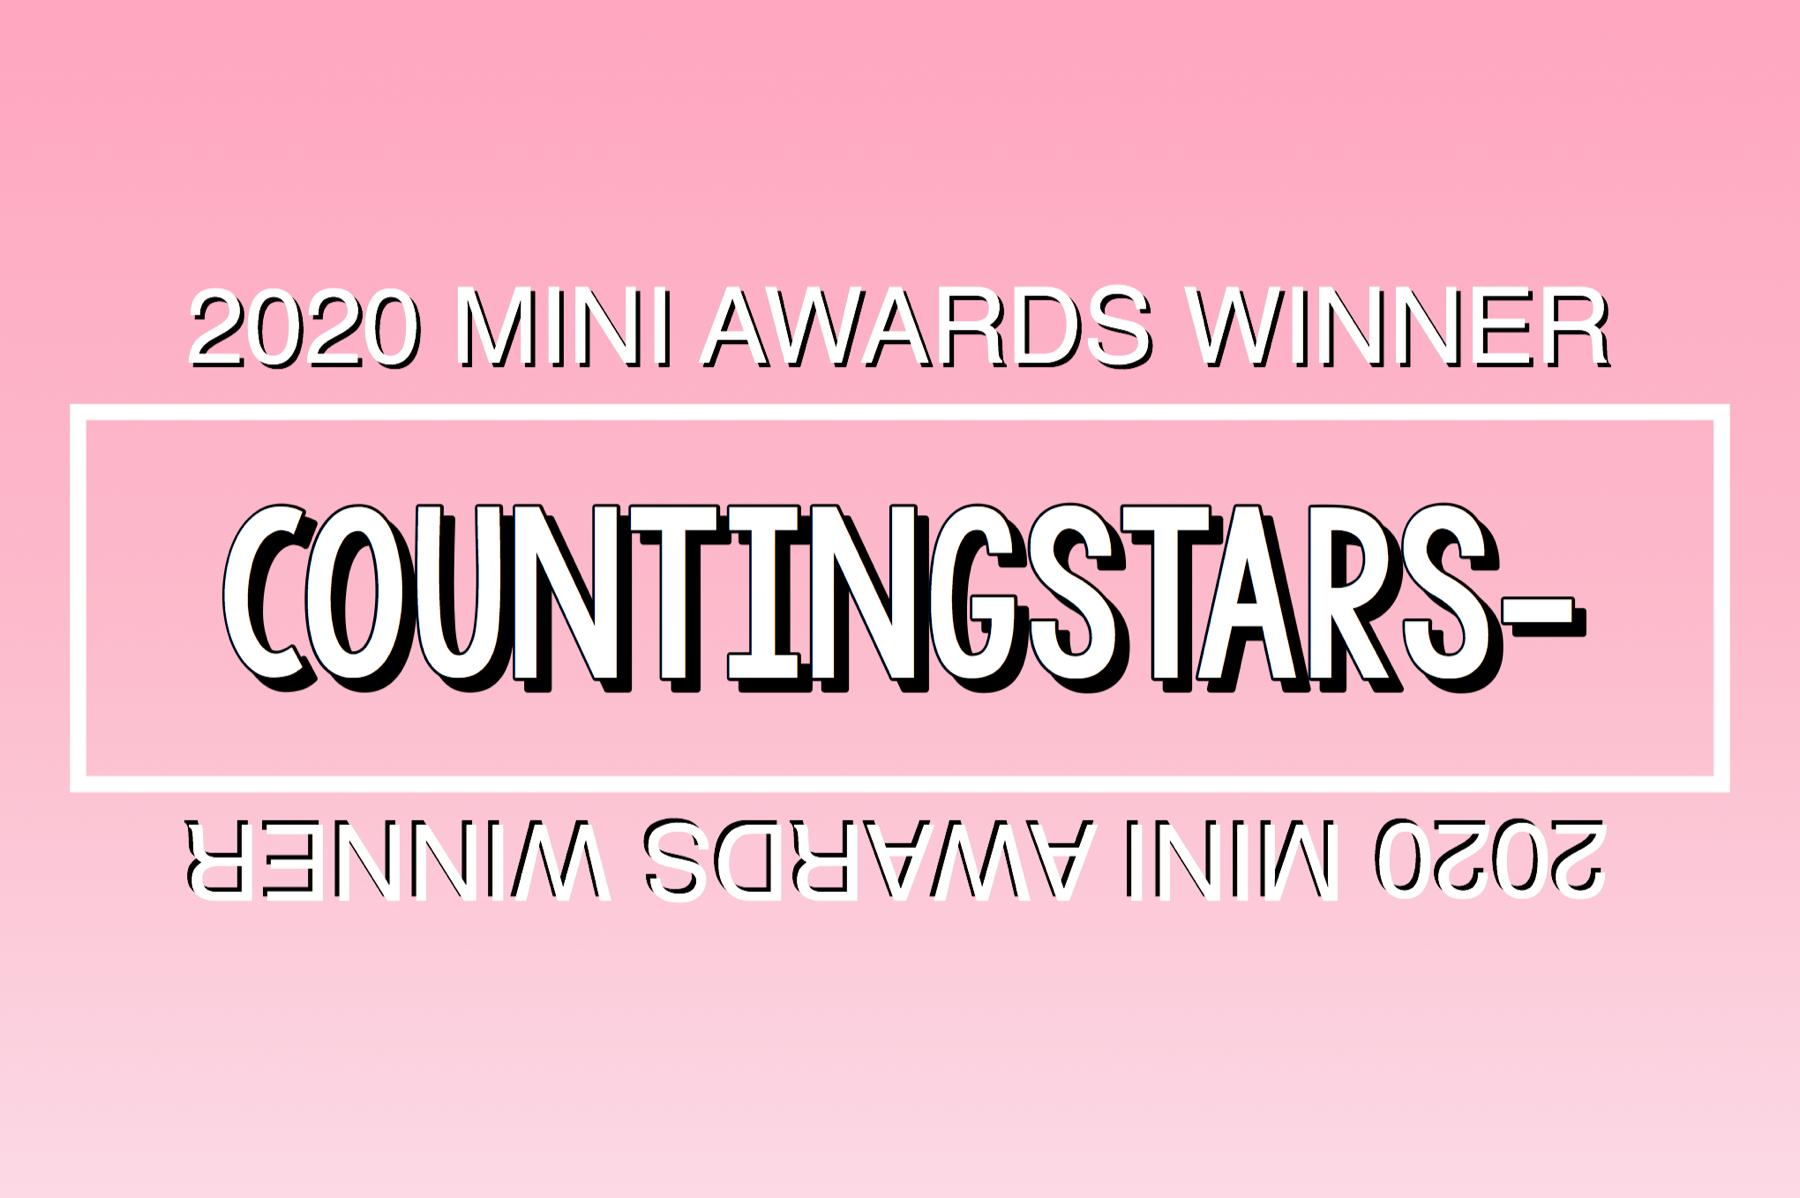 2020 Mini Awards Winner @countingstars-!